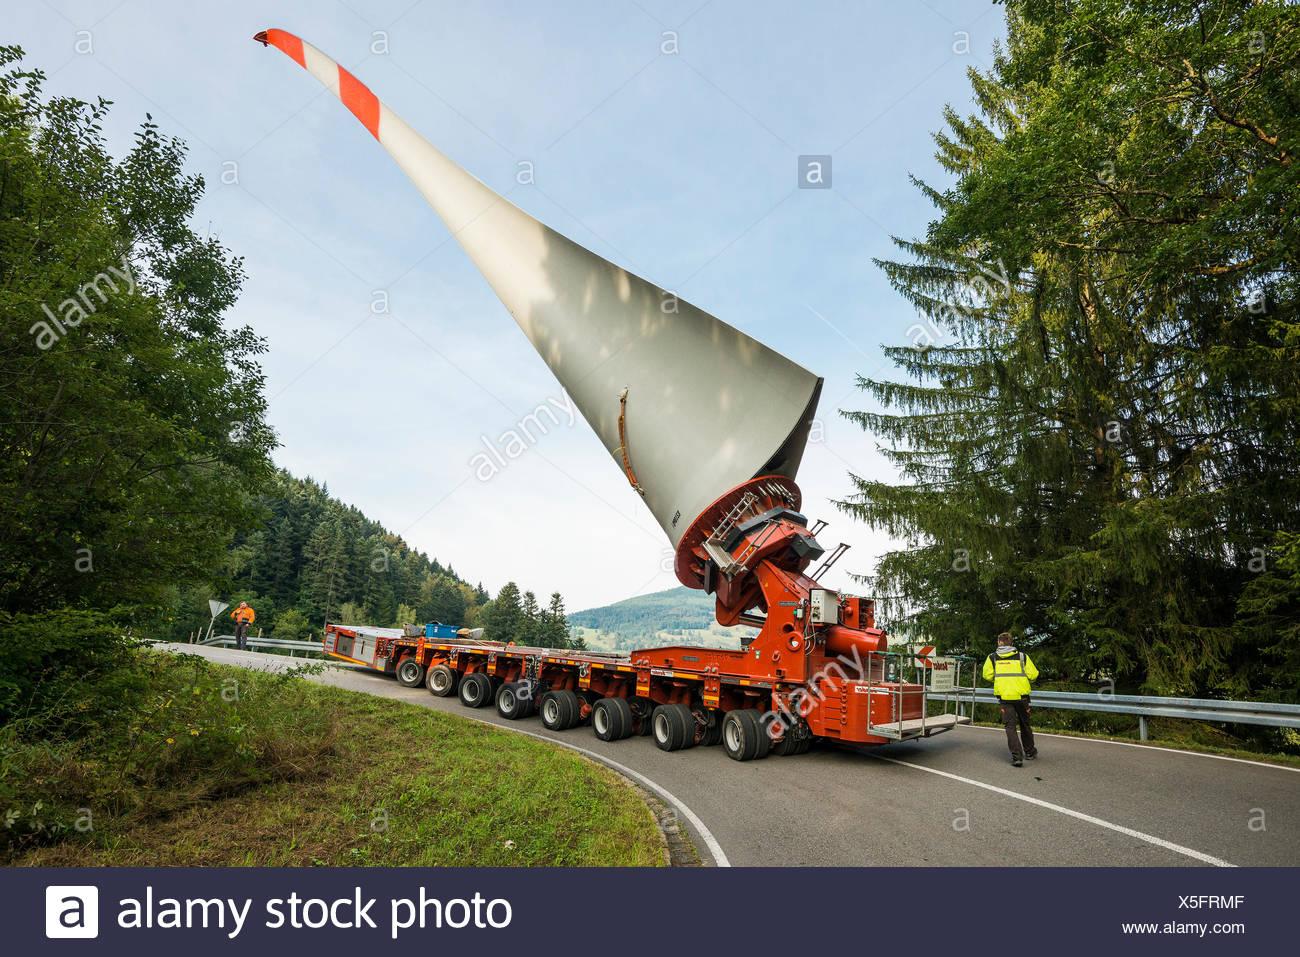 Heavy transport, wind turbine blade on heavy goods vehicle, curvy road in Schönau, Black Forest, Baden-Württemberg, Germany - Stock Image